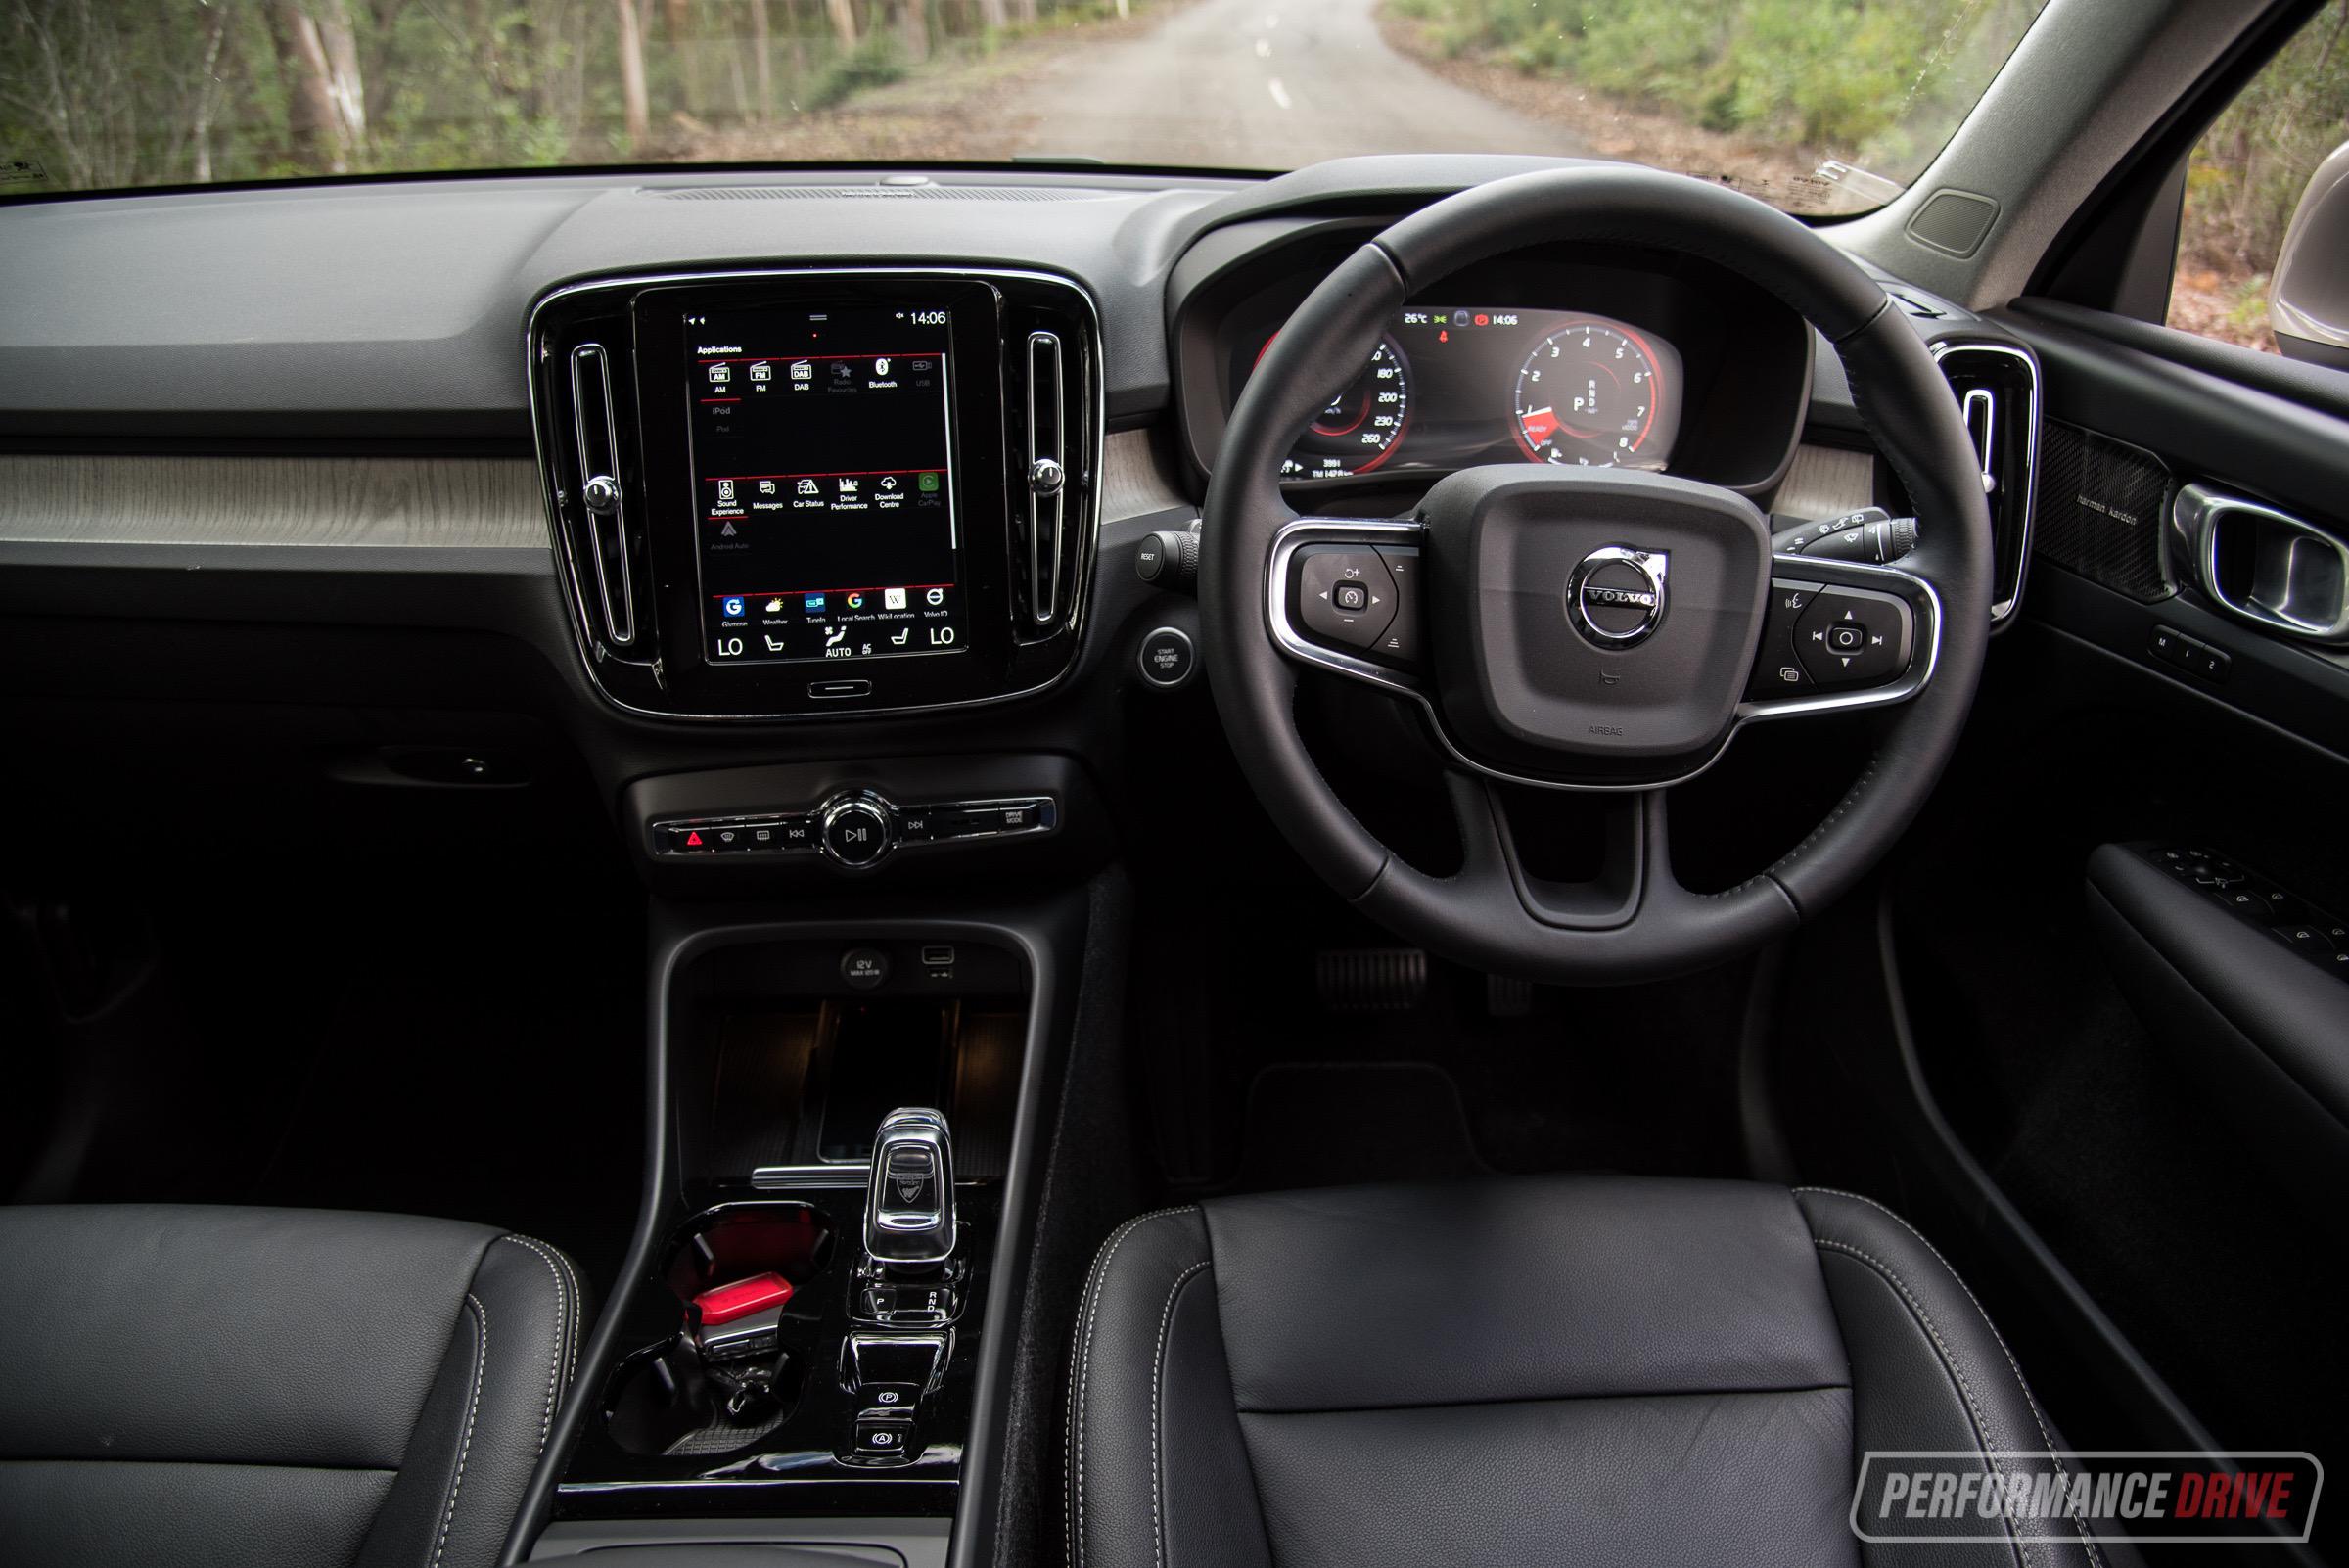 2019 Volvo Xc40 T4 Inscription Review Video